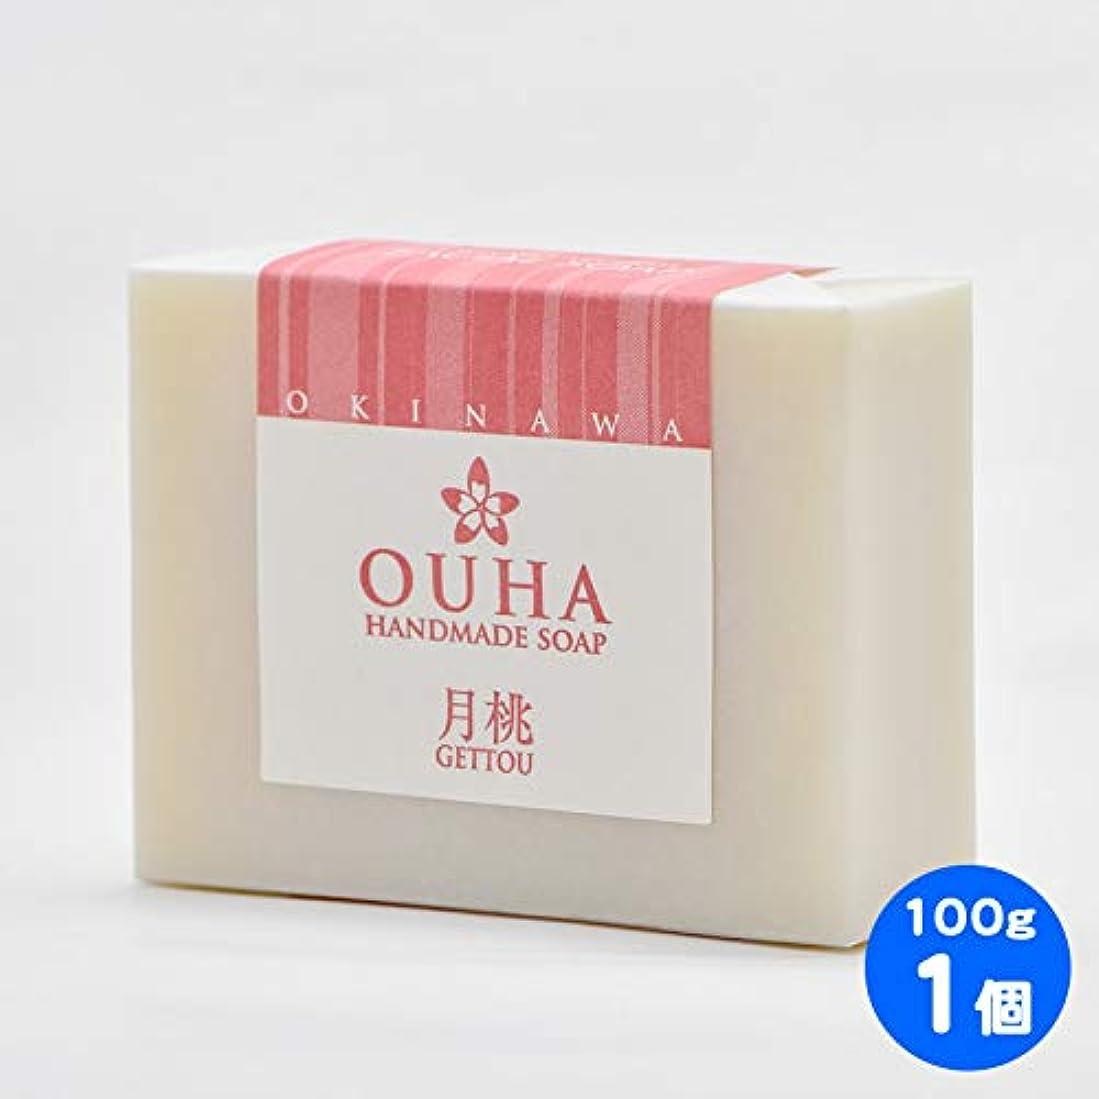 癌市場見かけ上【送料無料 定形外郵便】沖縄県産 OUHAソープ 月桃 石鹸 100g 1個